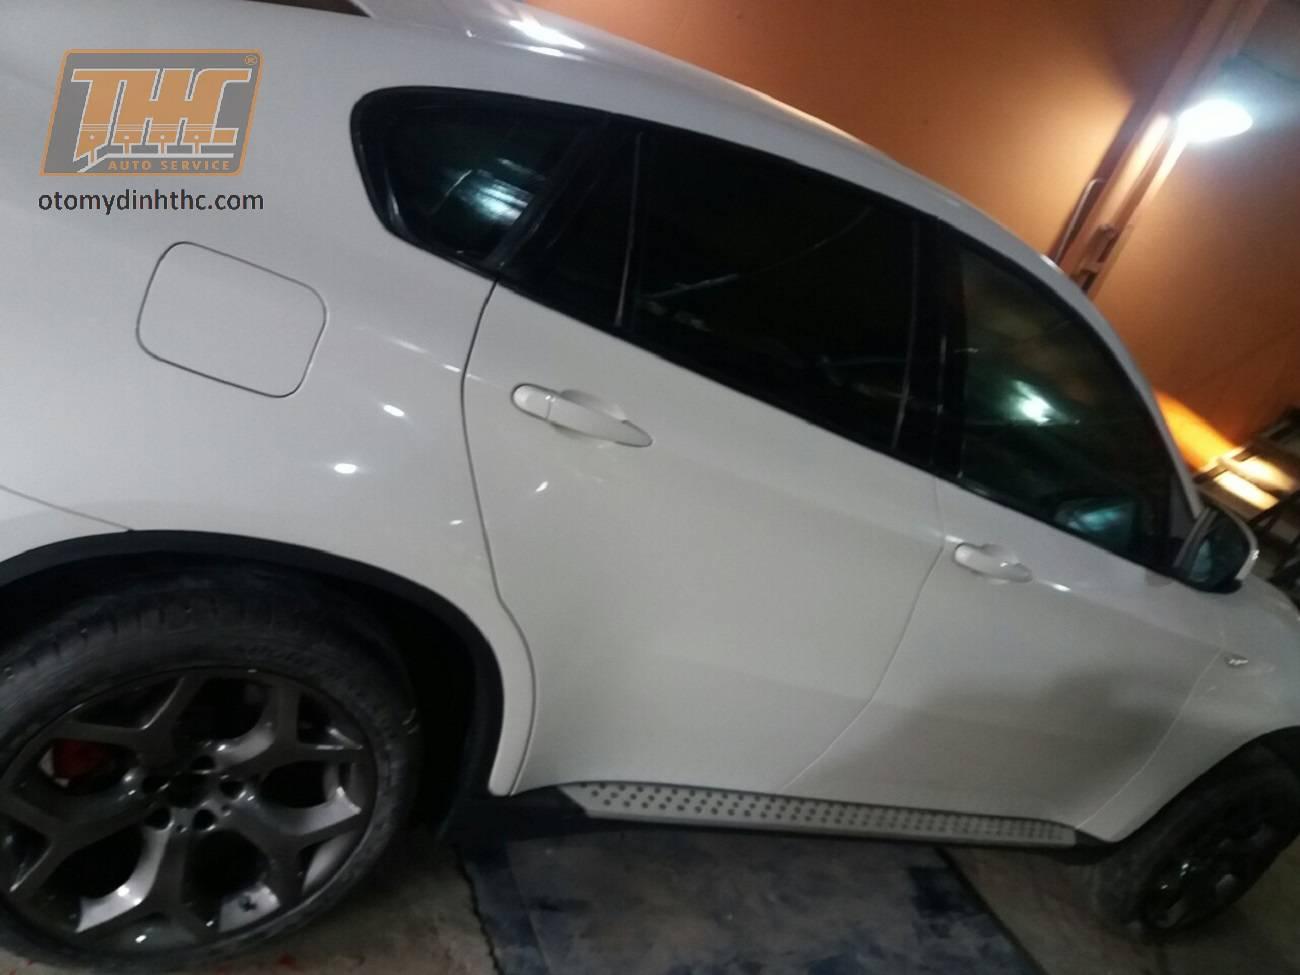 son-lazang-mau-titan-anh-thep-BMW-X6-9